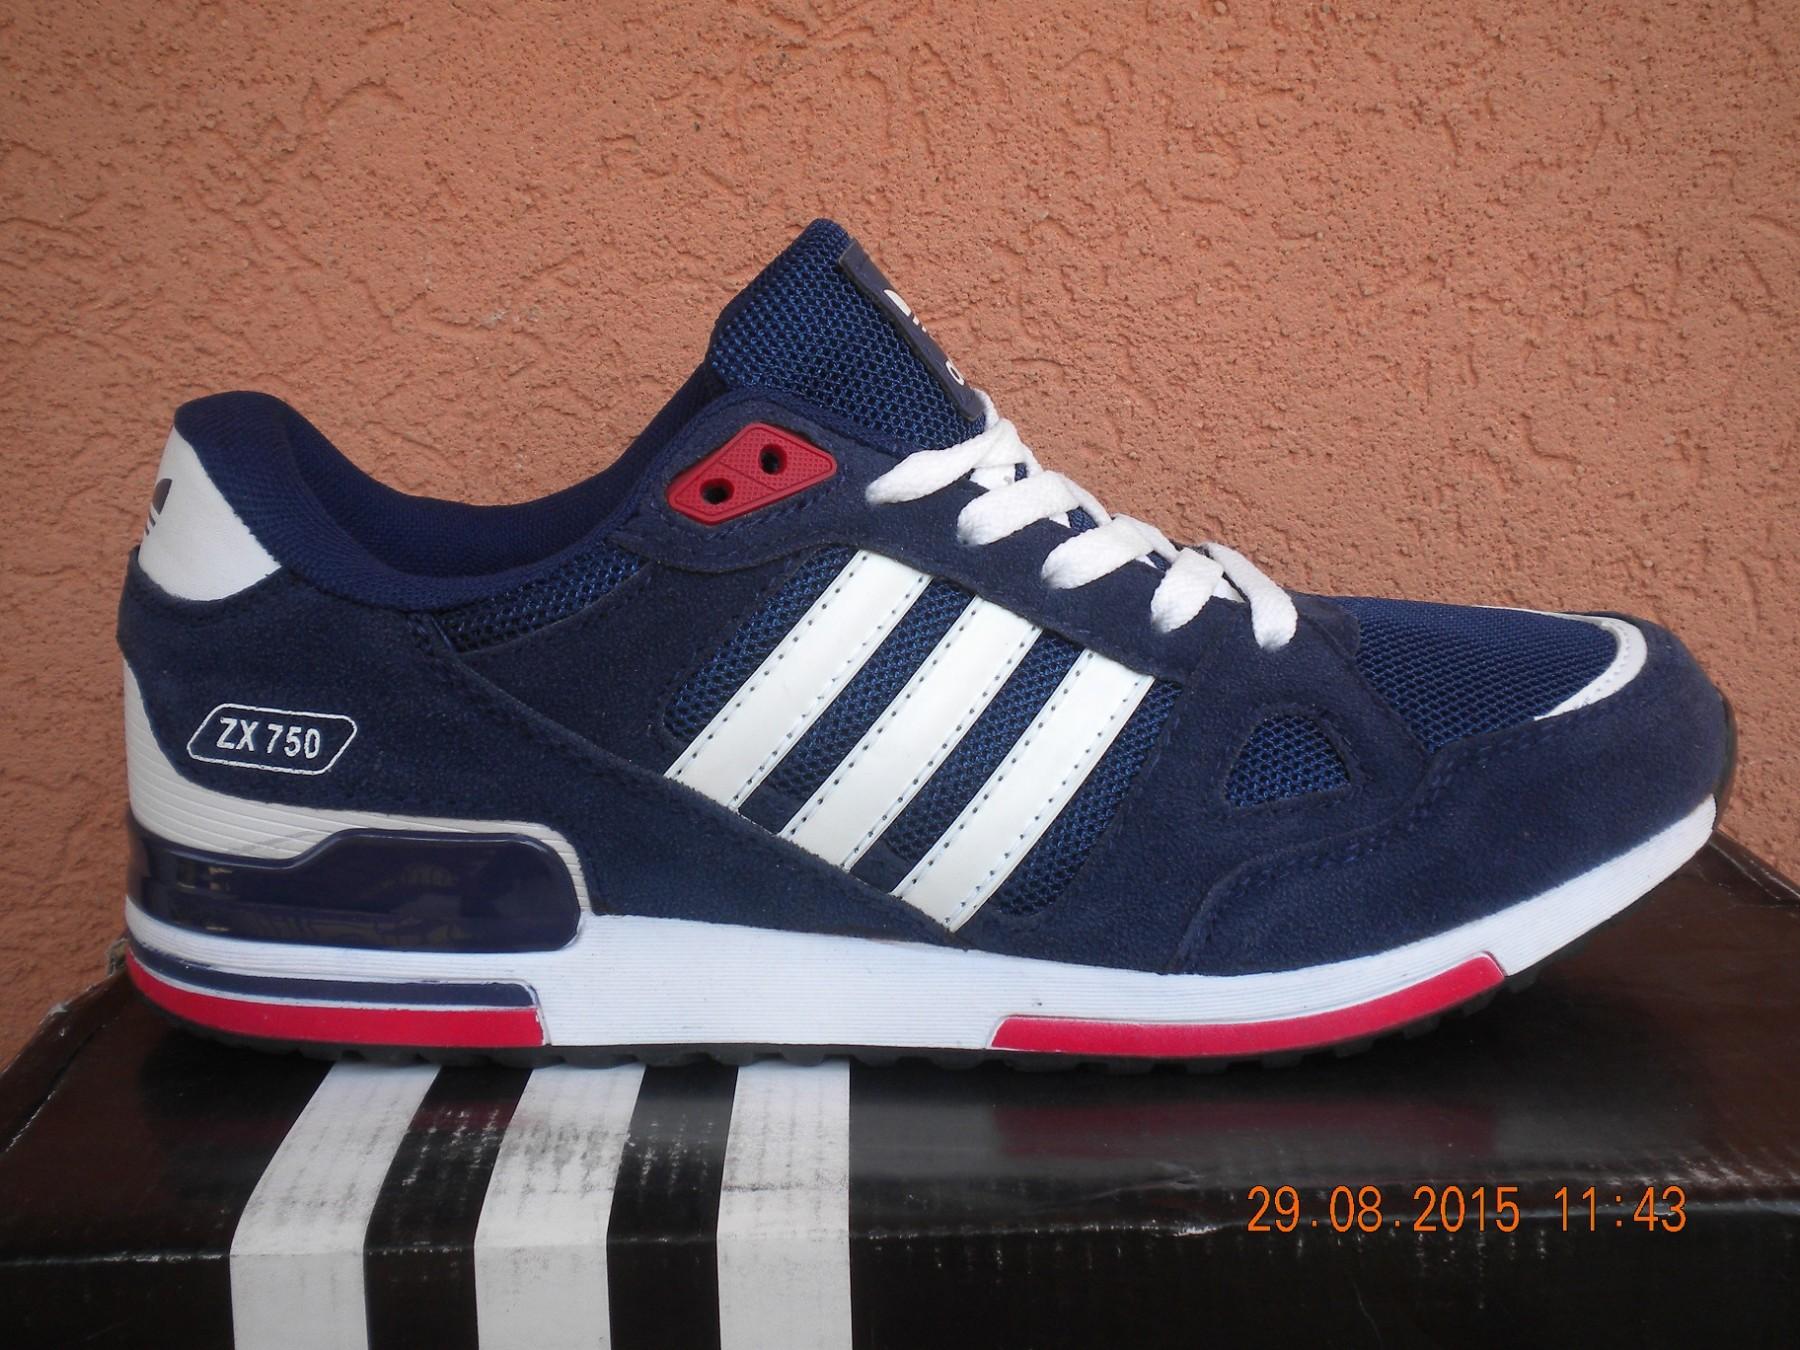 ZAGREB prodajem tenisice adidas zx 750 povoljno 600 kn zagreb slika  50424319 . ...